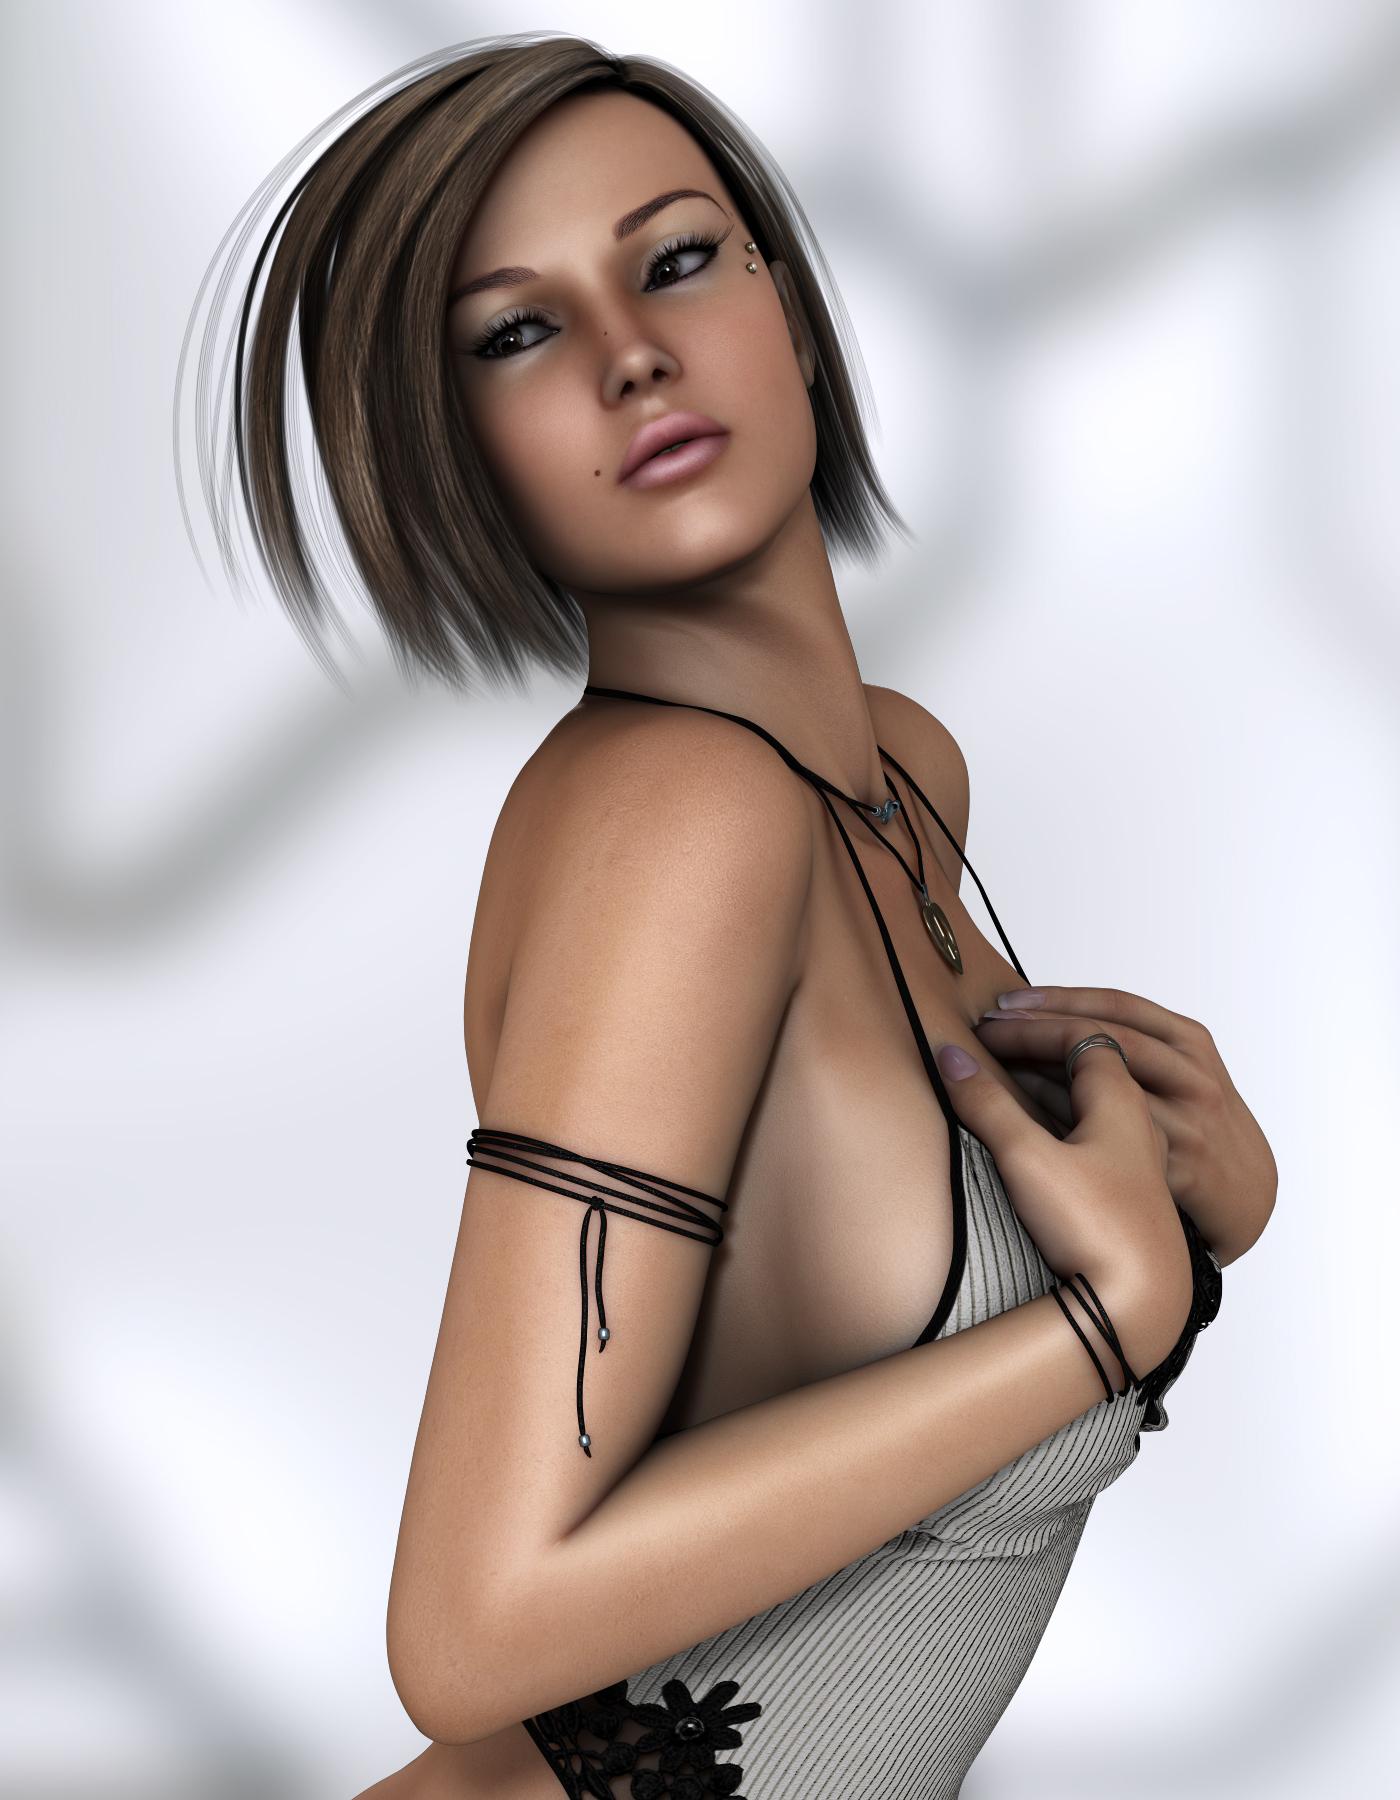 Erica by Eclesi4stiK